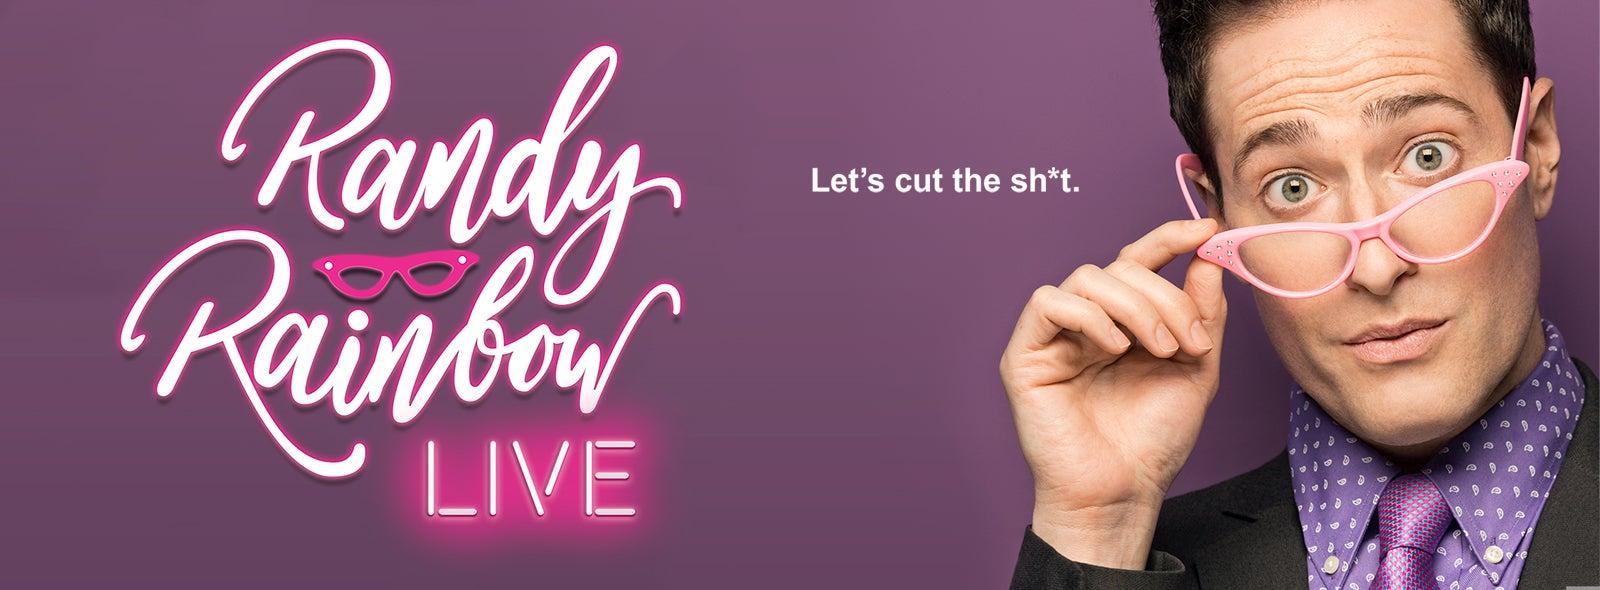 Randy Rainbow Live!